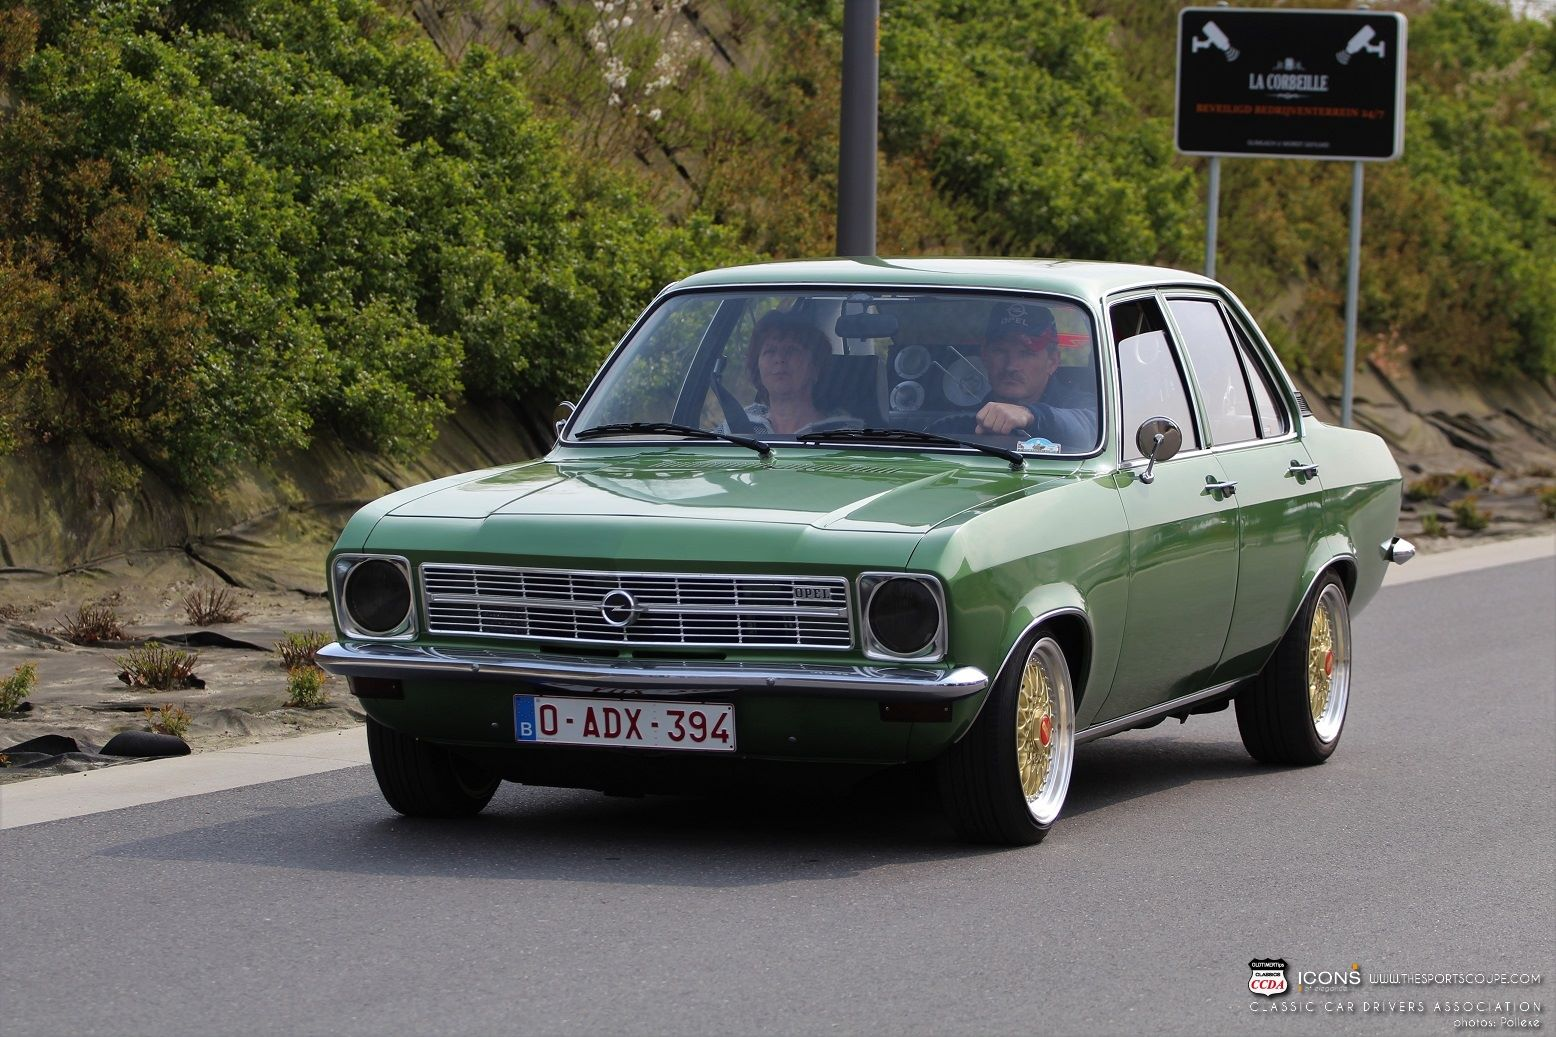 Opel-mix--7-4-2019--13